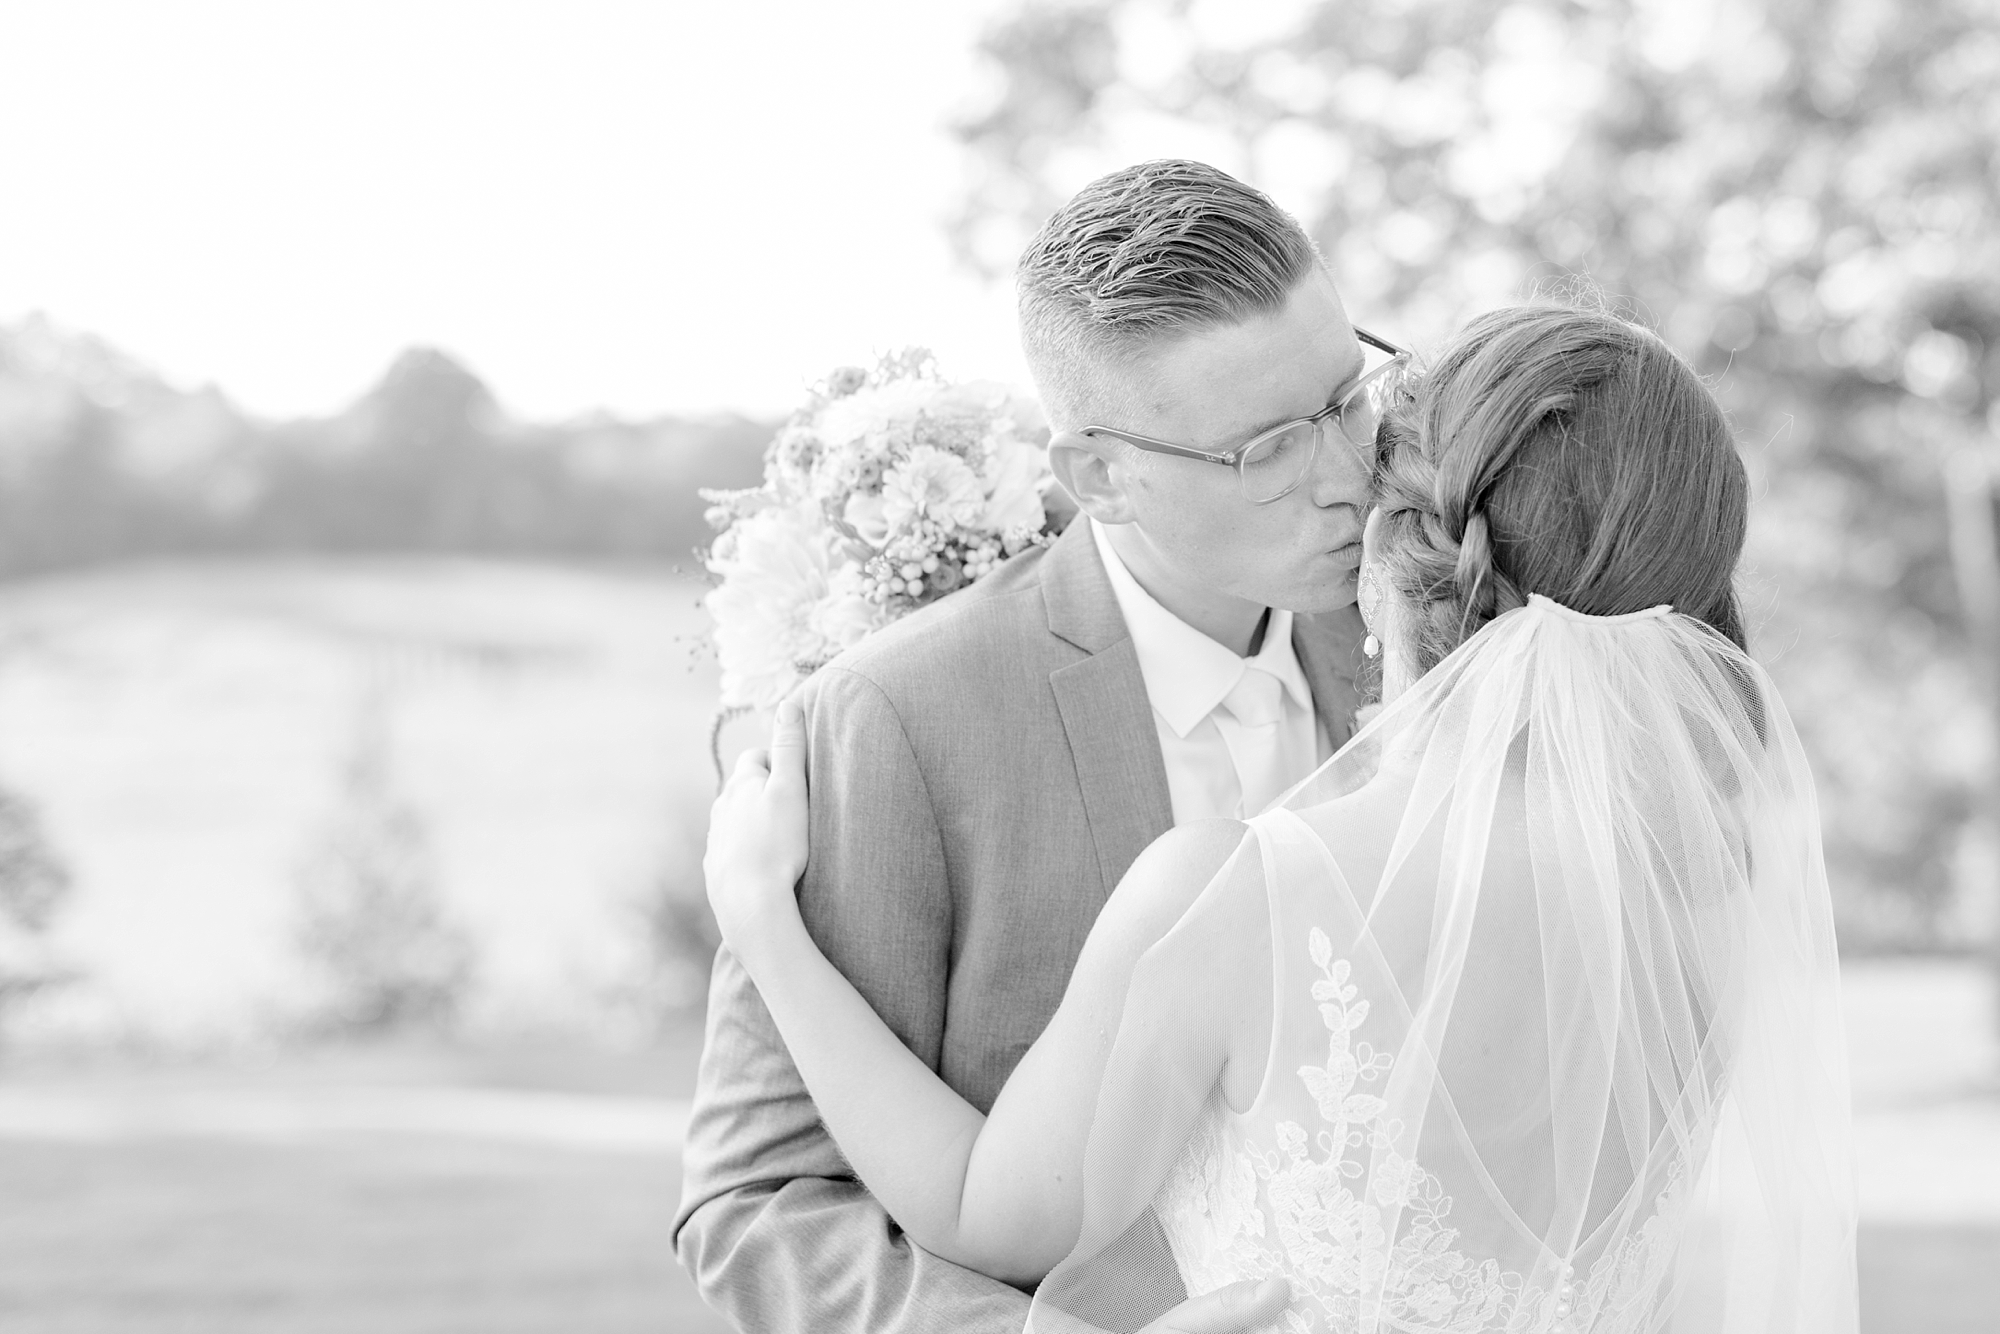 Tomaszewski 3-Bride & Groom-1107_anna grace photography baltimore maryland wedding photographer rockland estates wedding photo.jpg